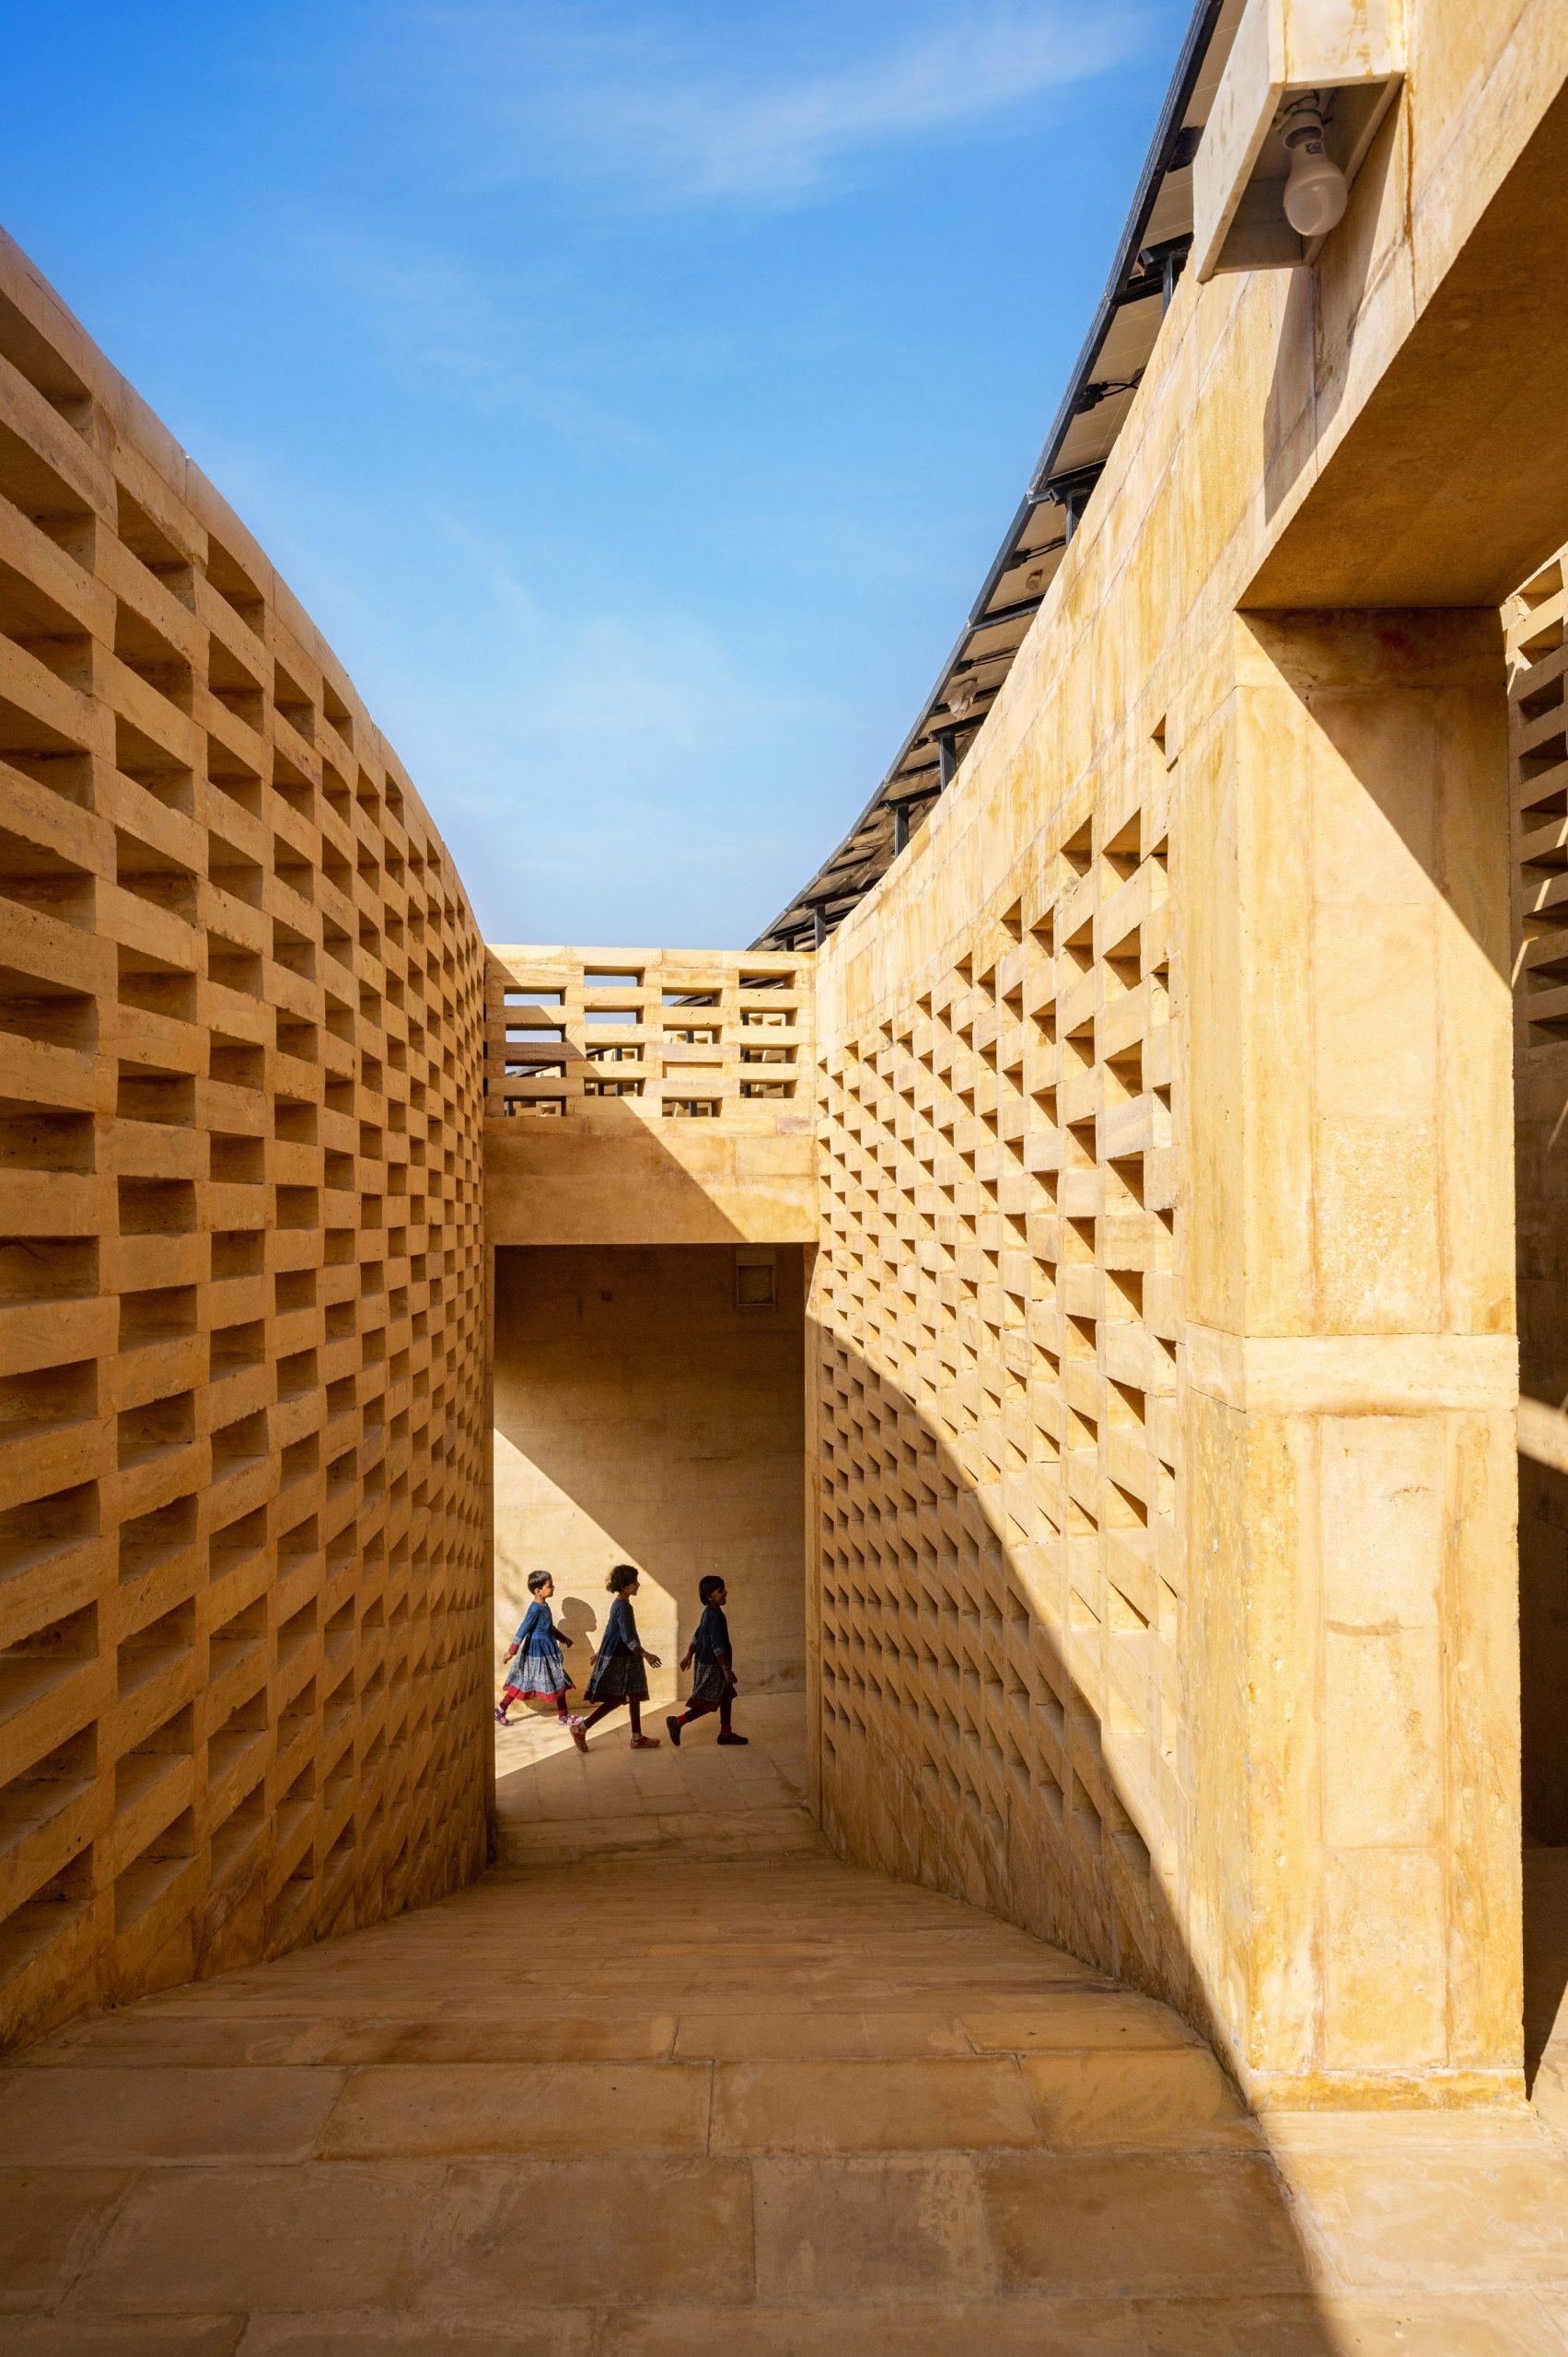 The brick has an ornamental organisation by Diana Kellogg Architects